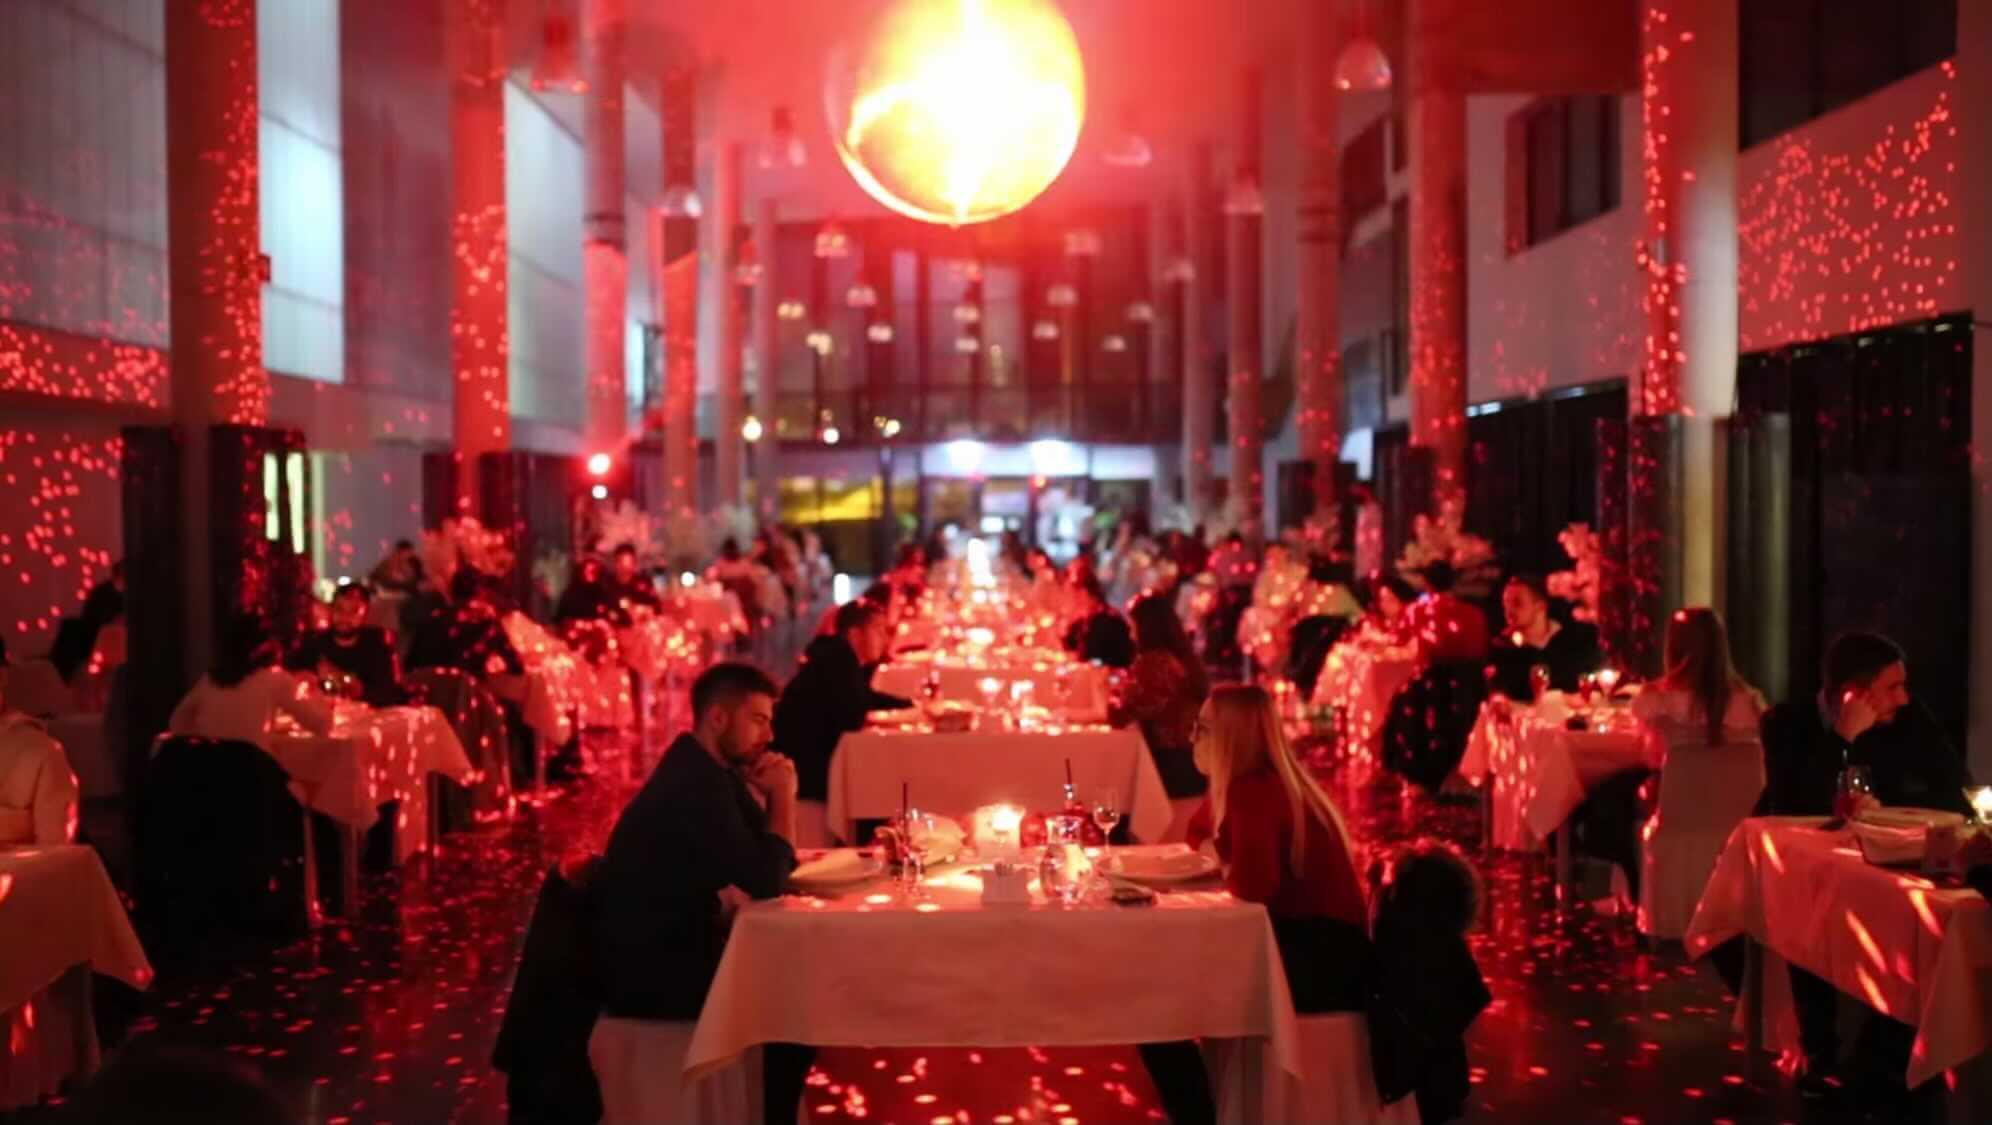 [VIDEO] Ovaj fascinantan prizor je iz menze: Na Valentinovo studentima pripremili romantičnu večeru